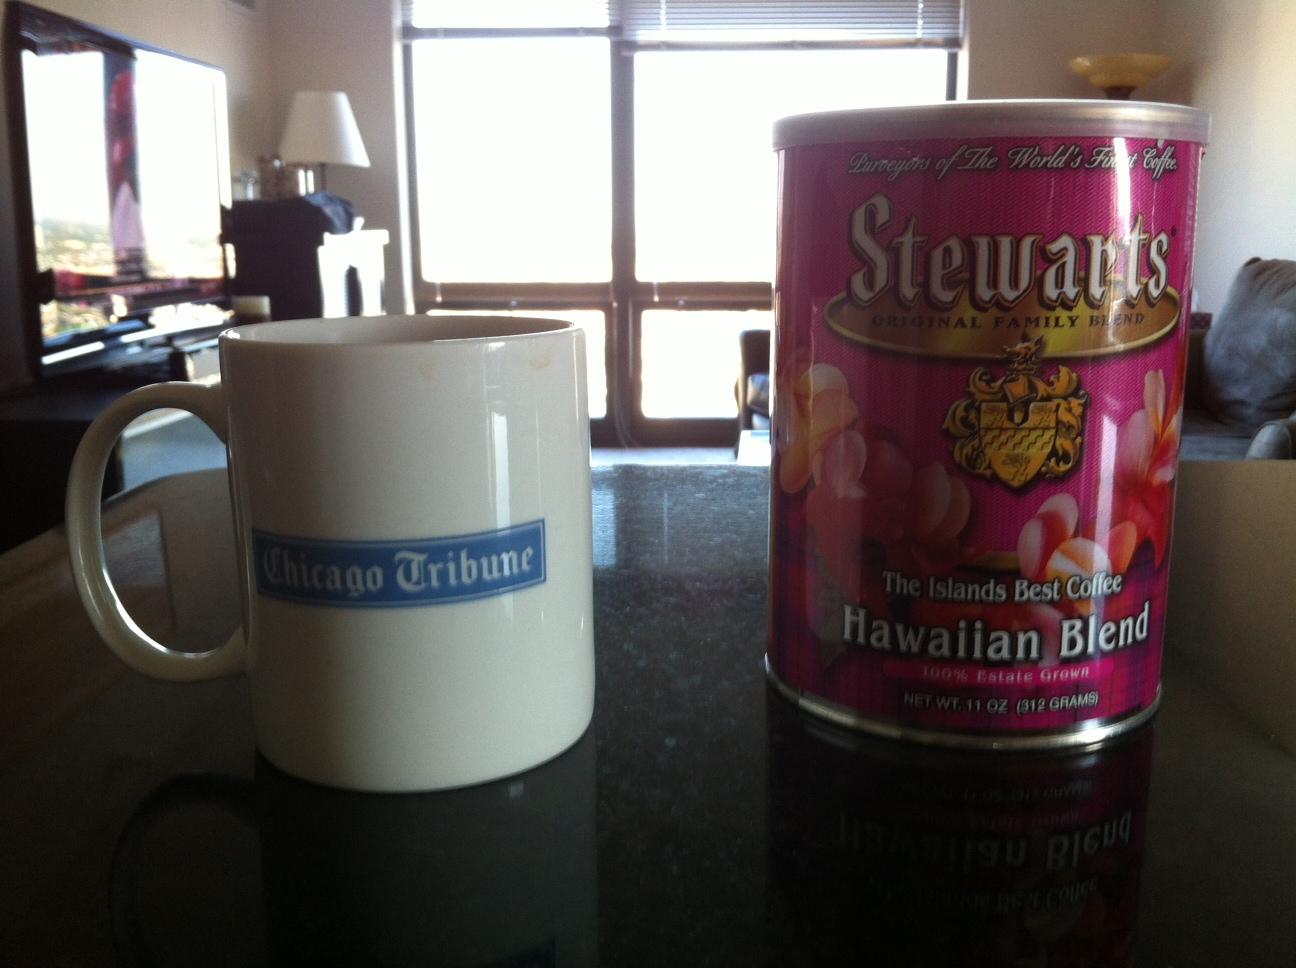 Stewarts-Hawaiian-Coffee-review